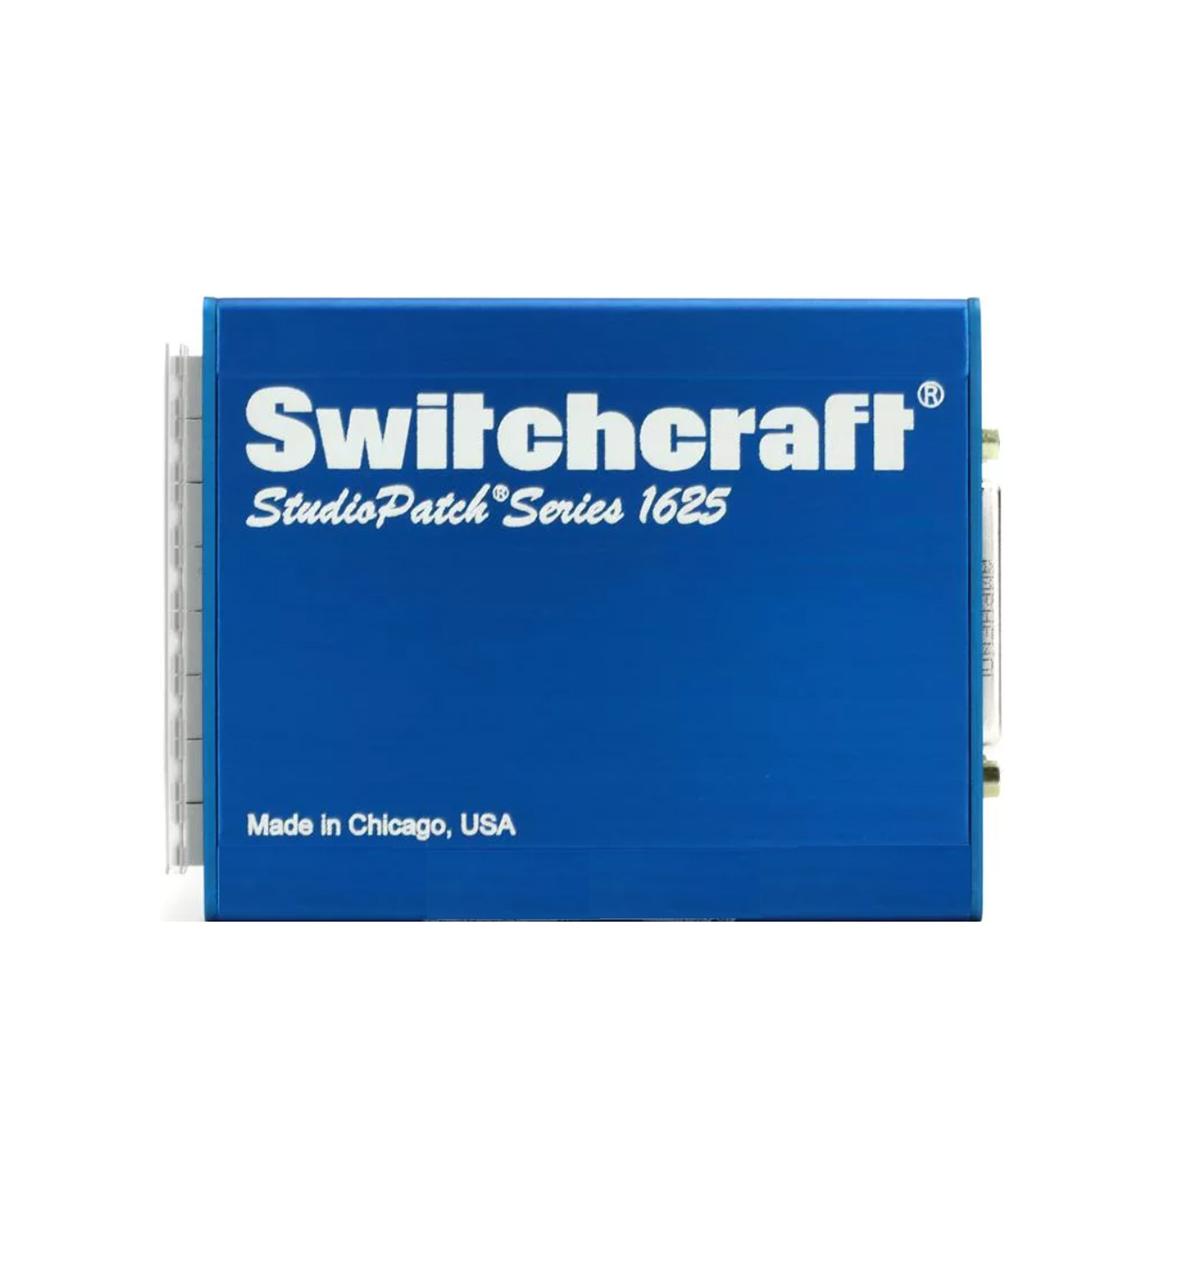 PATCHBAY TT BANTAM / DB25 SWITCHCRAFT STUDIO PATCH 1625